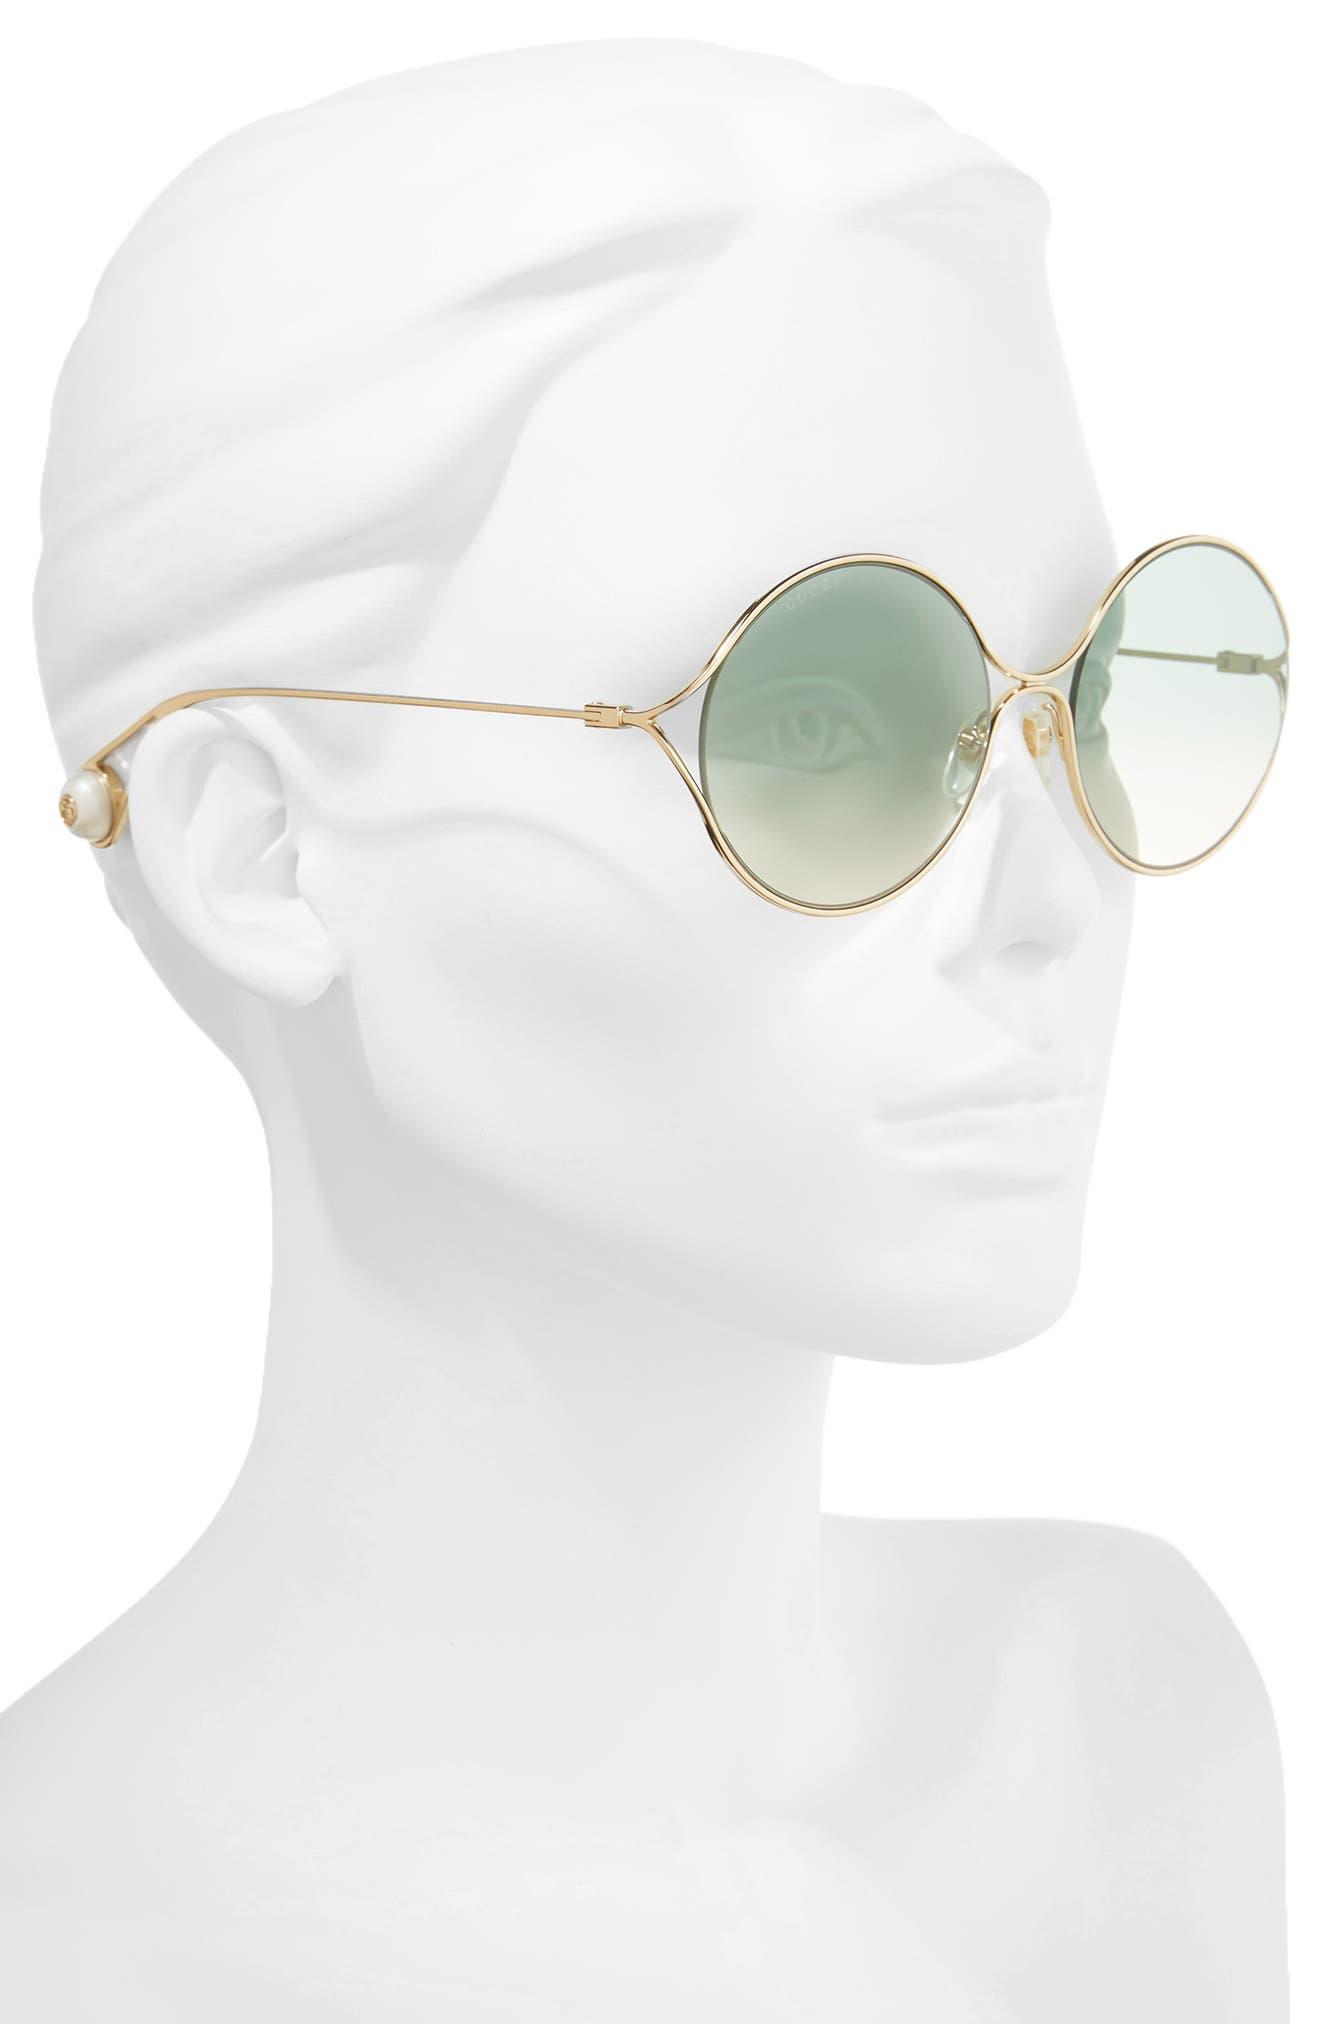 58mm Gradient Lens Round Sunglasses,                             Alternate thumbnail 2, color,                             GOLD/ SAGE/ PINK